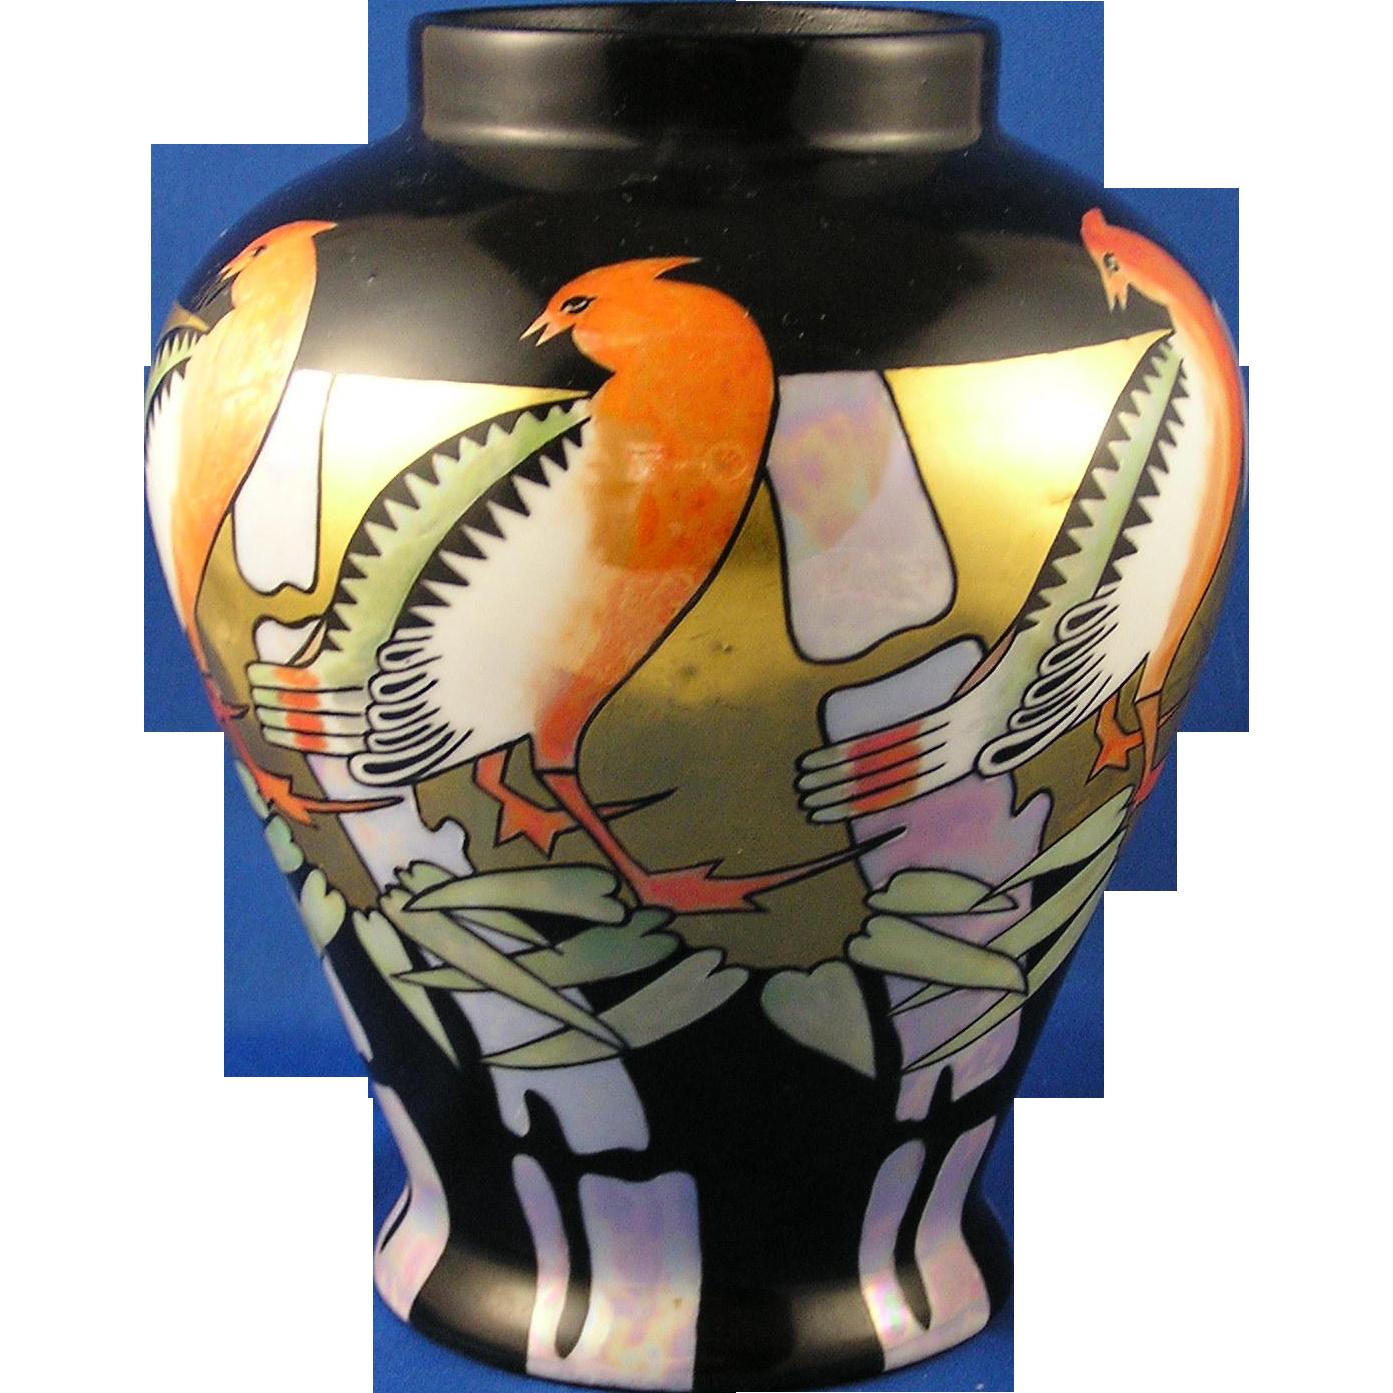 oepiag czechoslovakia art deco lustre bird motif vase signed c b from darkflowers on ruby lane. Black Bedroom Furniture Sets. Home Design Ideas